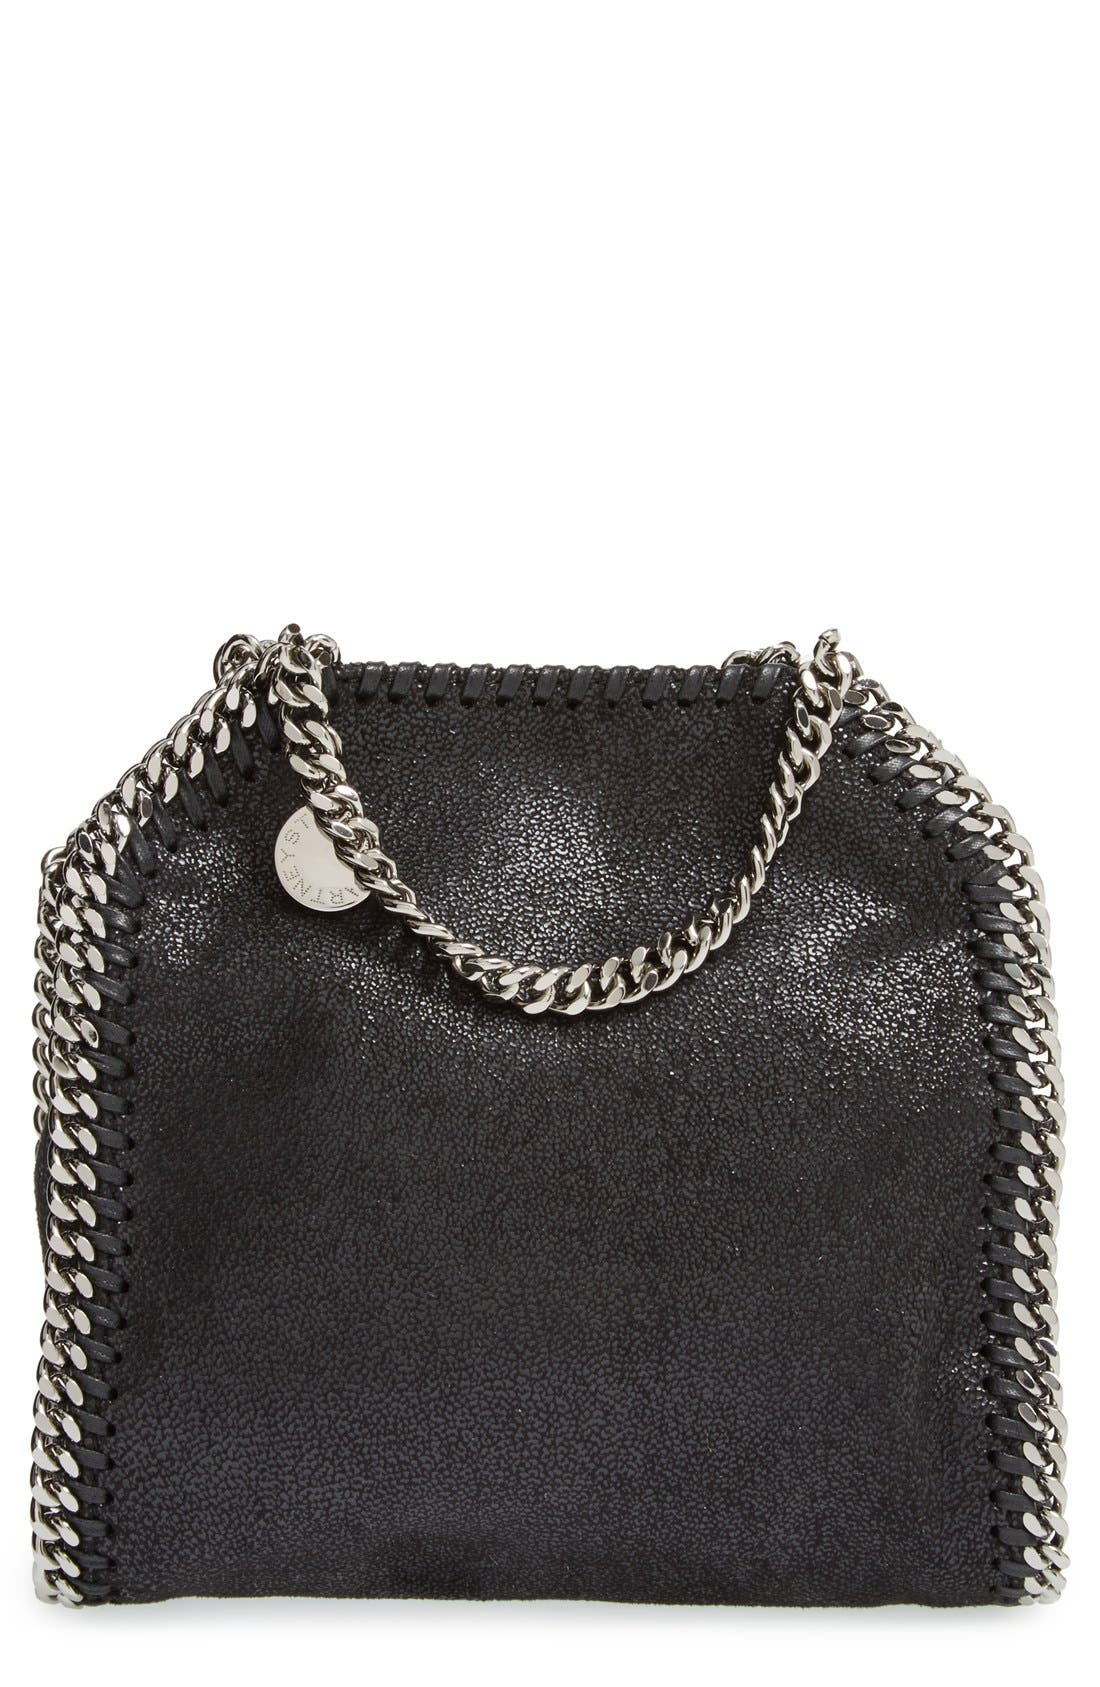 'Tiny Falabella' Faux Leather Crossbody Bag,                         Main,                         color, Black